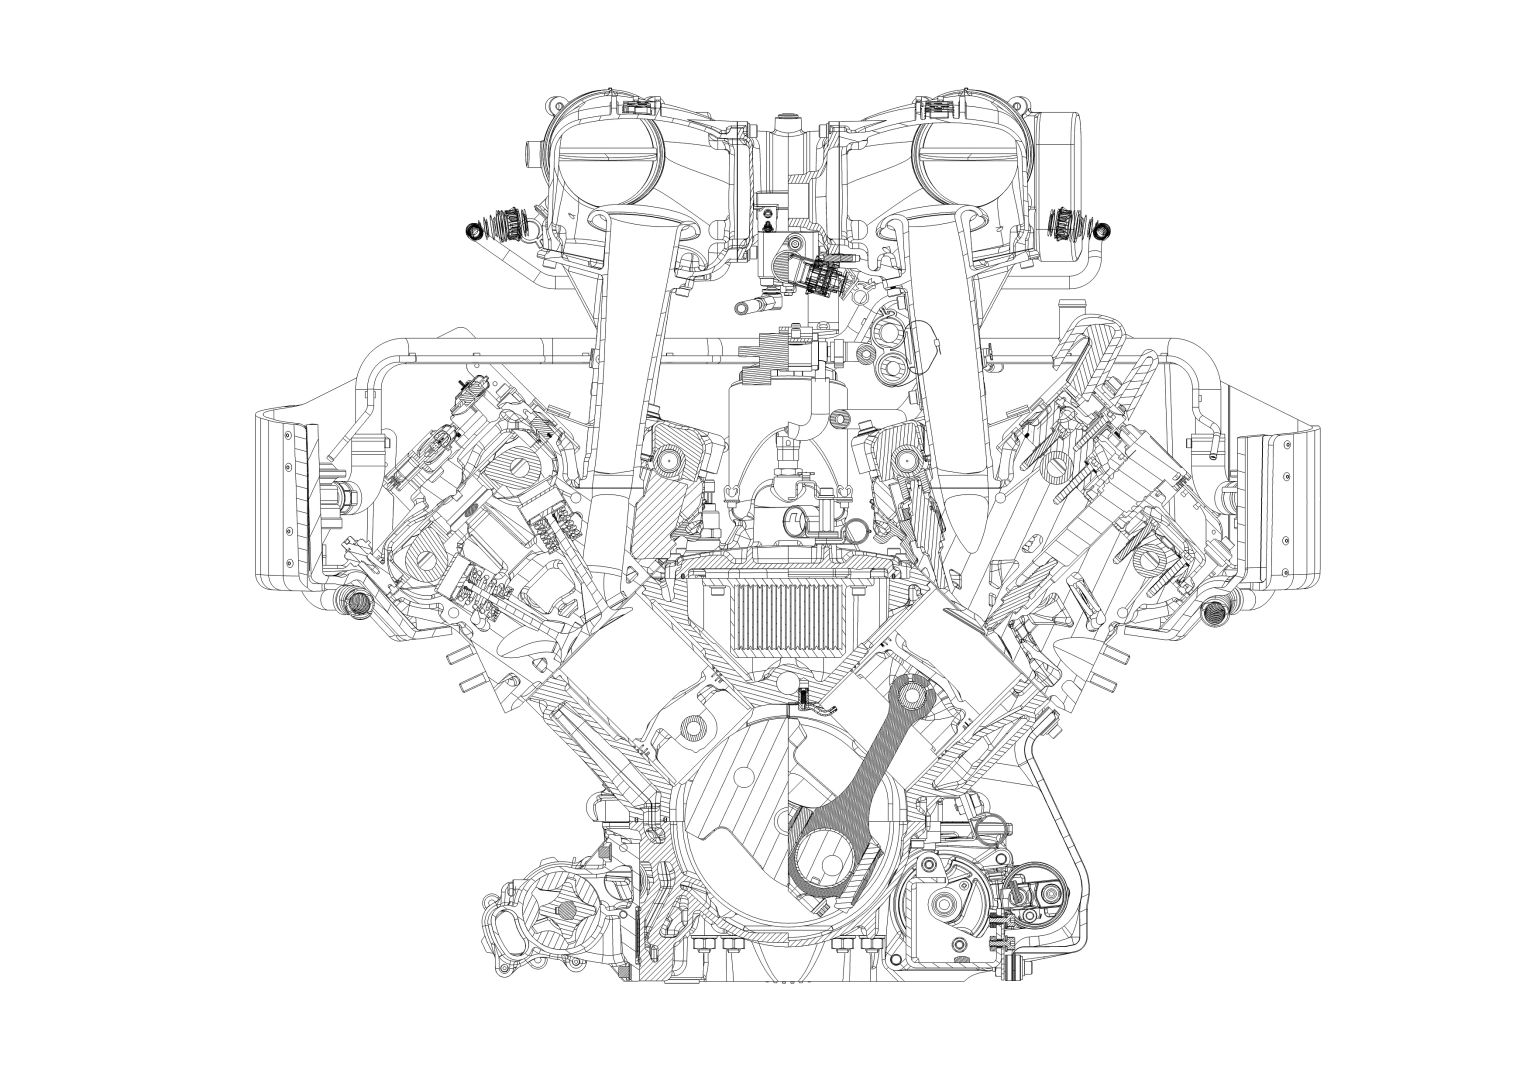 Ferrari 456 Gt Wiring Diagrams Not Lossing Diagram 1999 Mondial 612 Gto Spyder